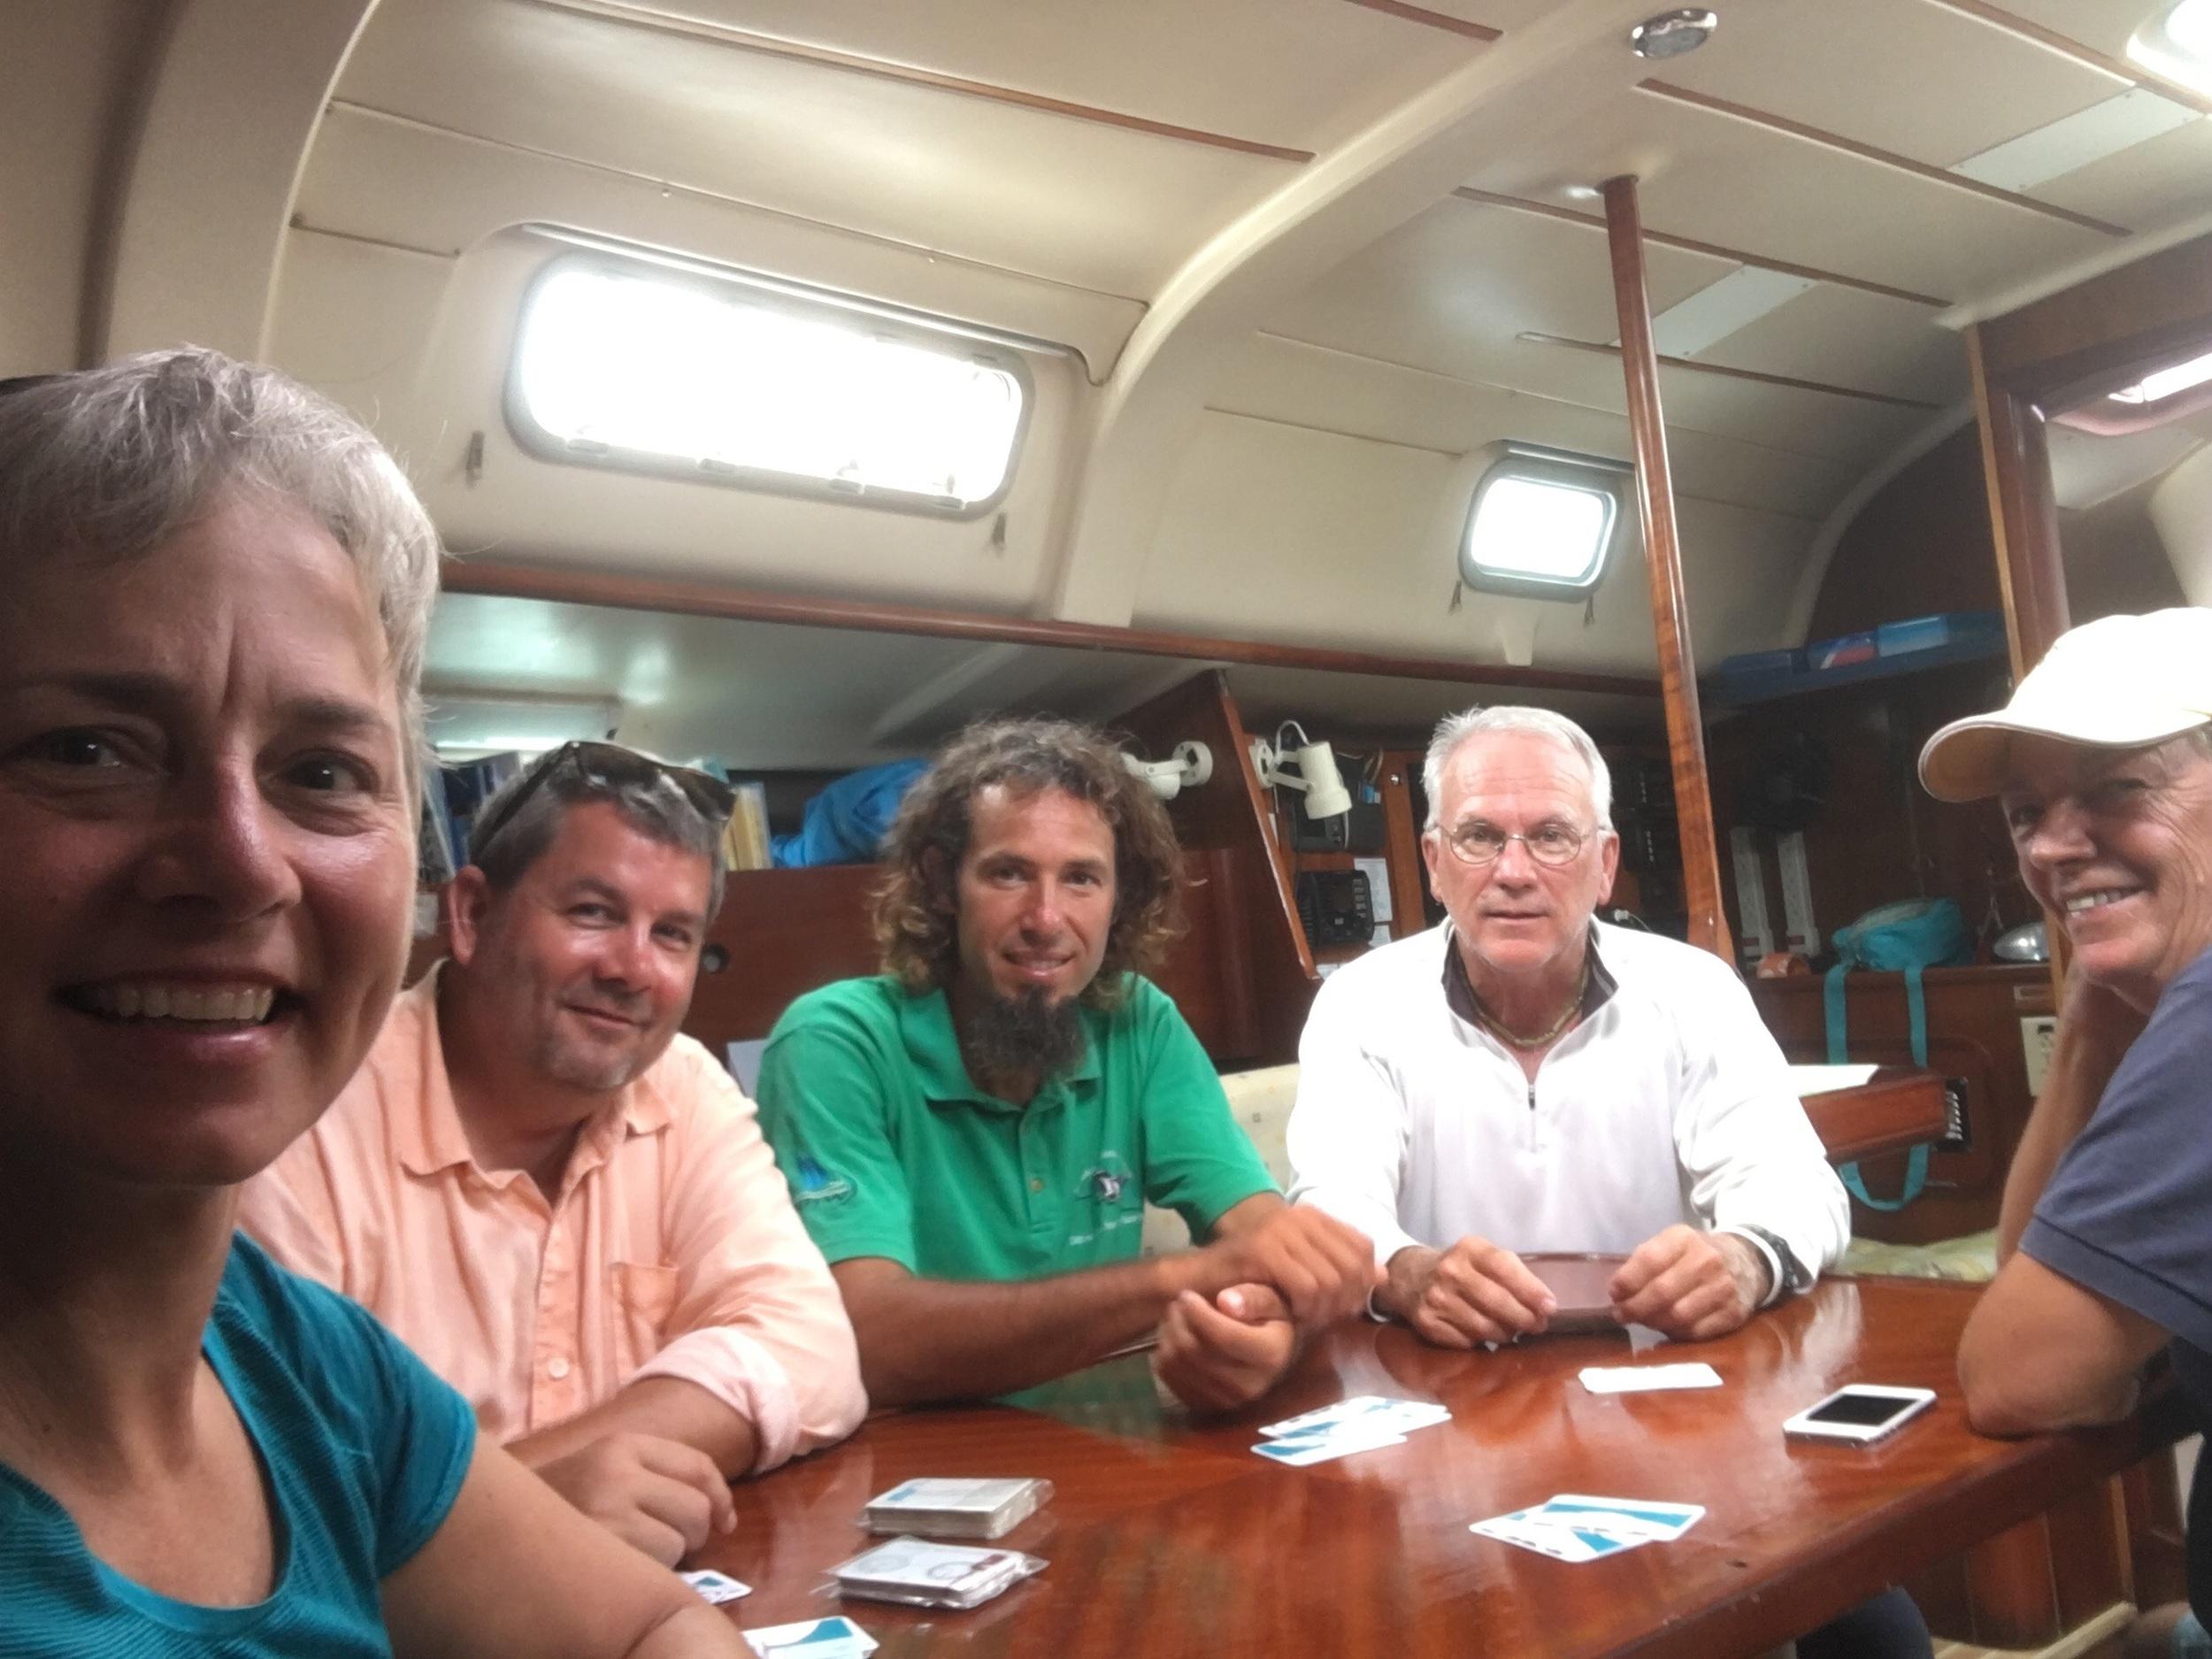 Lynn, Steve, Dian, Neil, Pippa below deck with ColReg cue cards